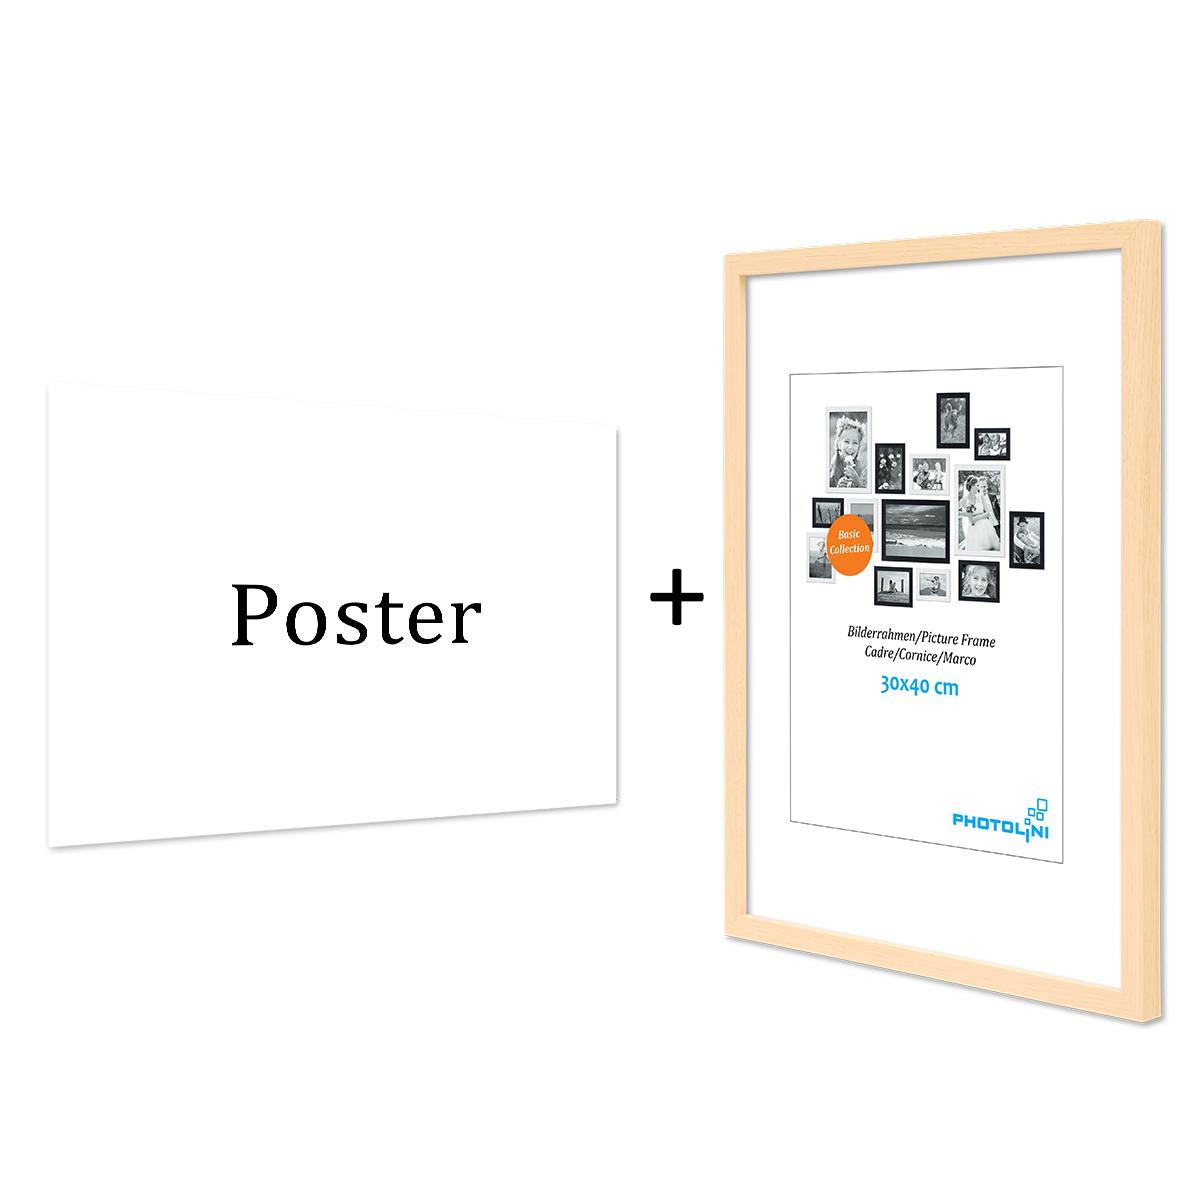 design poster mit bilderrahmen natur 39 frauenkopf 39 30x40 cm schwarz weiss motiv frau aquarell. Black Bedroom Furniture Sets. Home Design Ideas